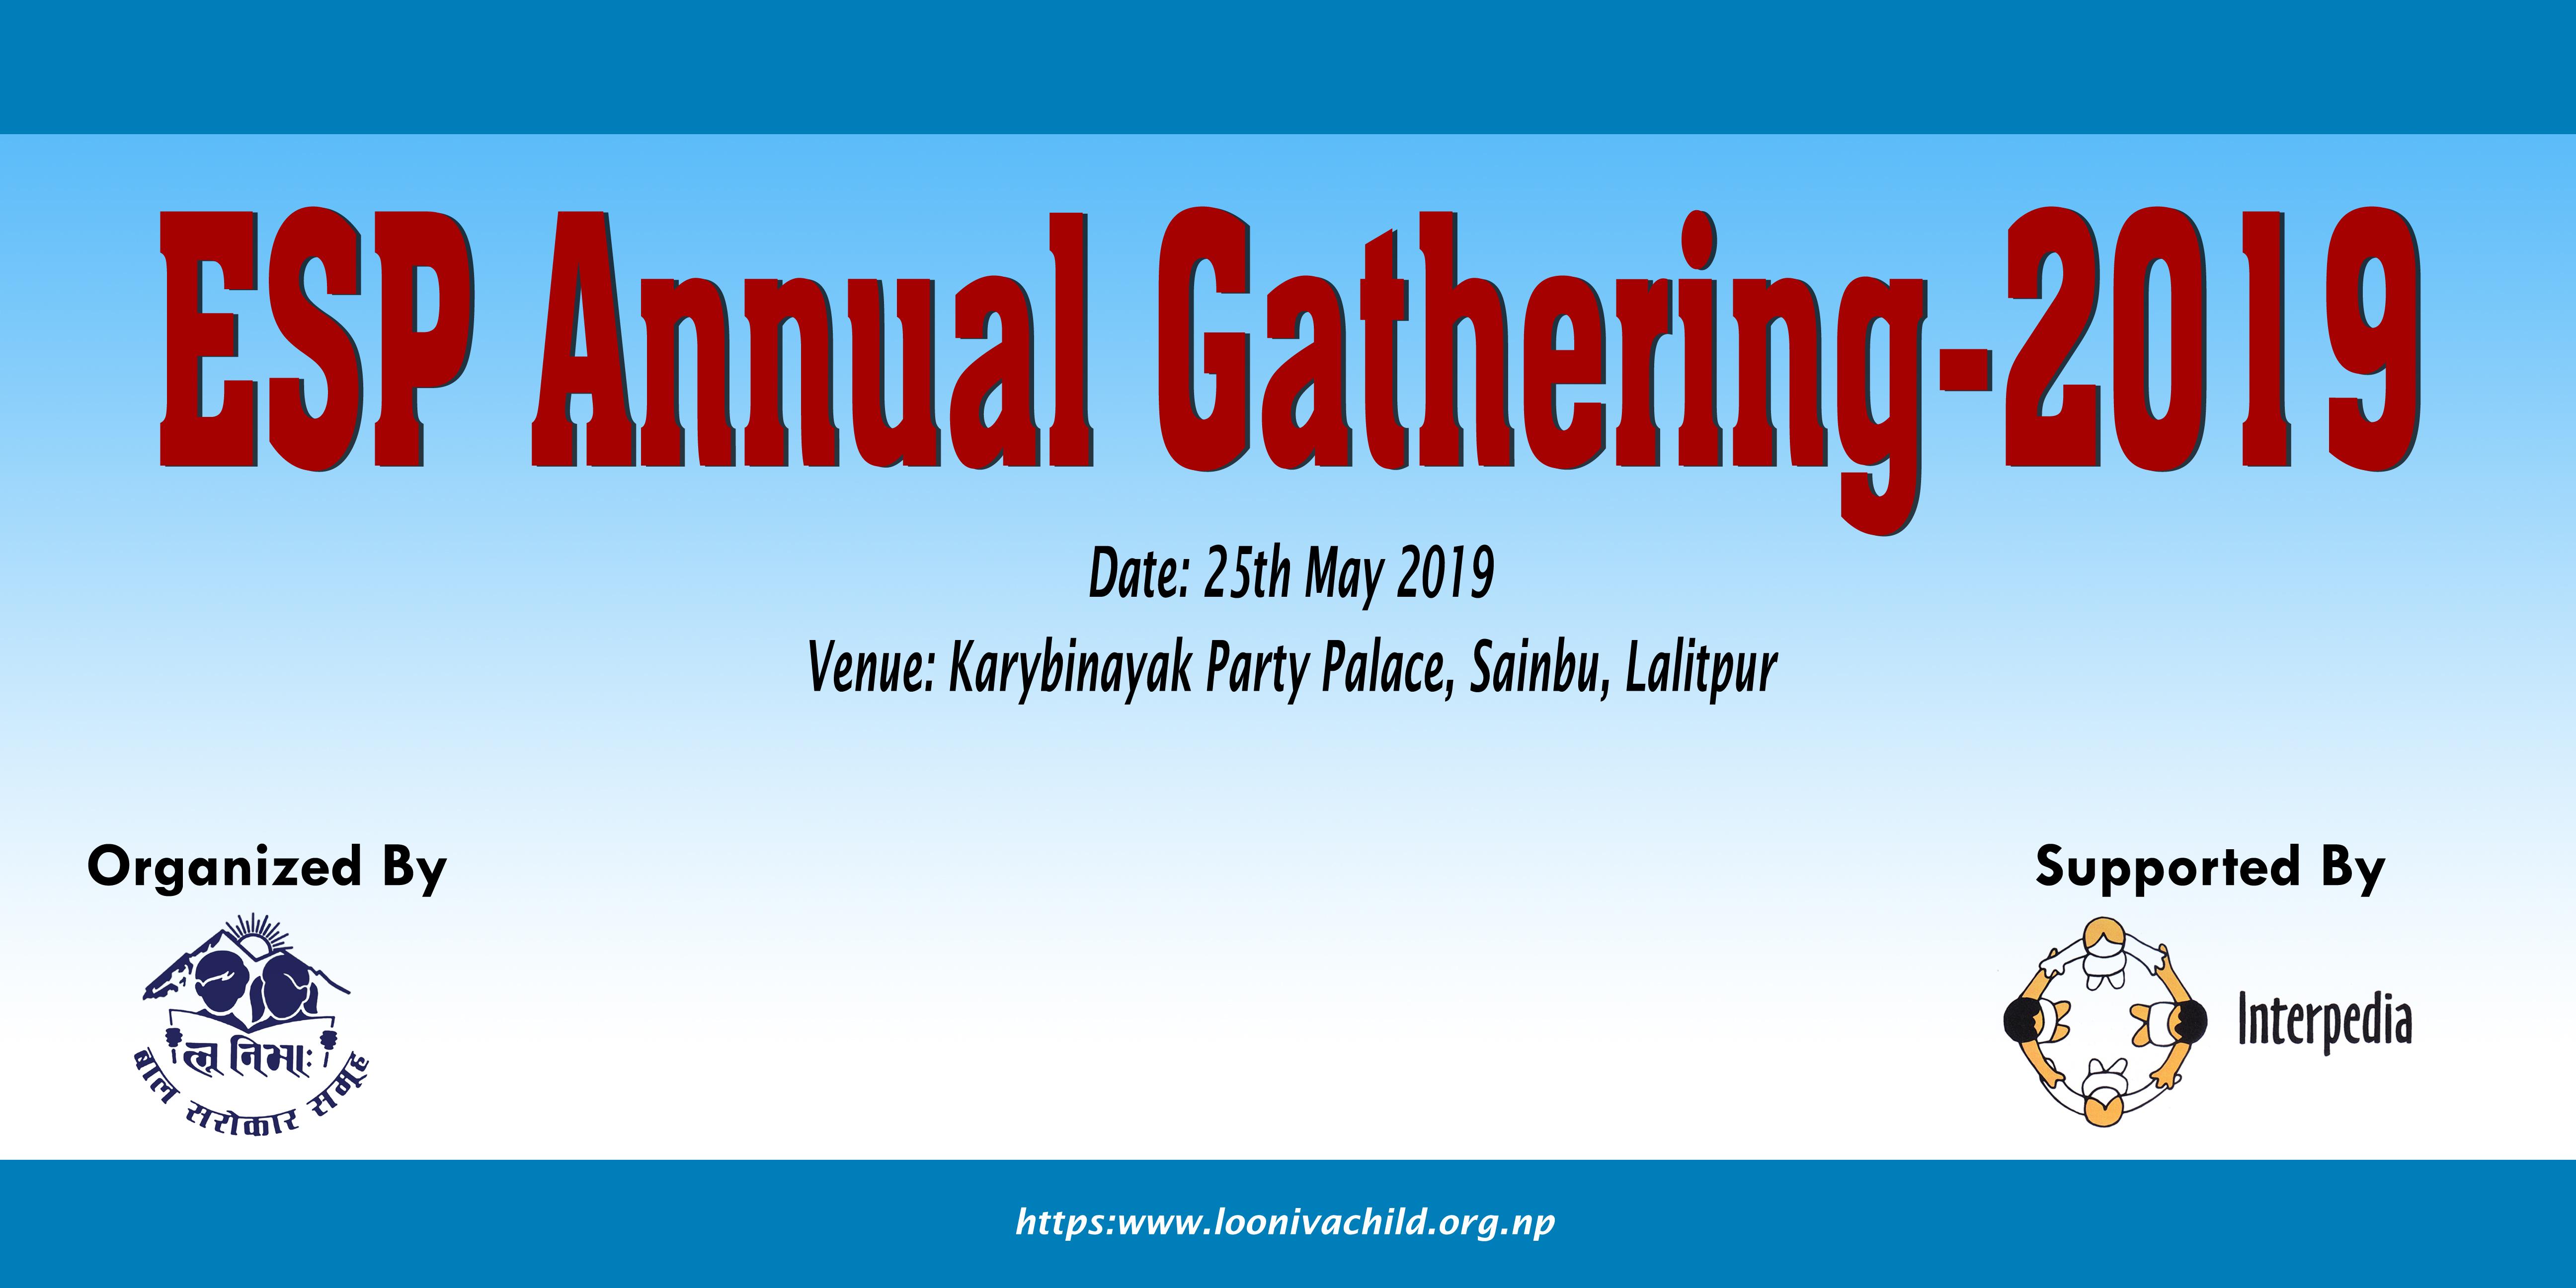 ESP Annual Gathering - 2019